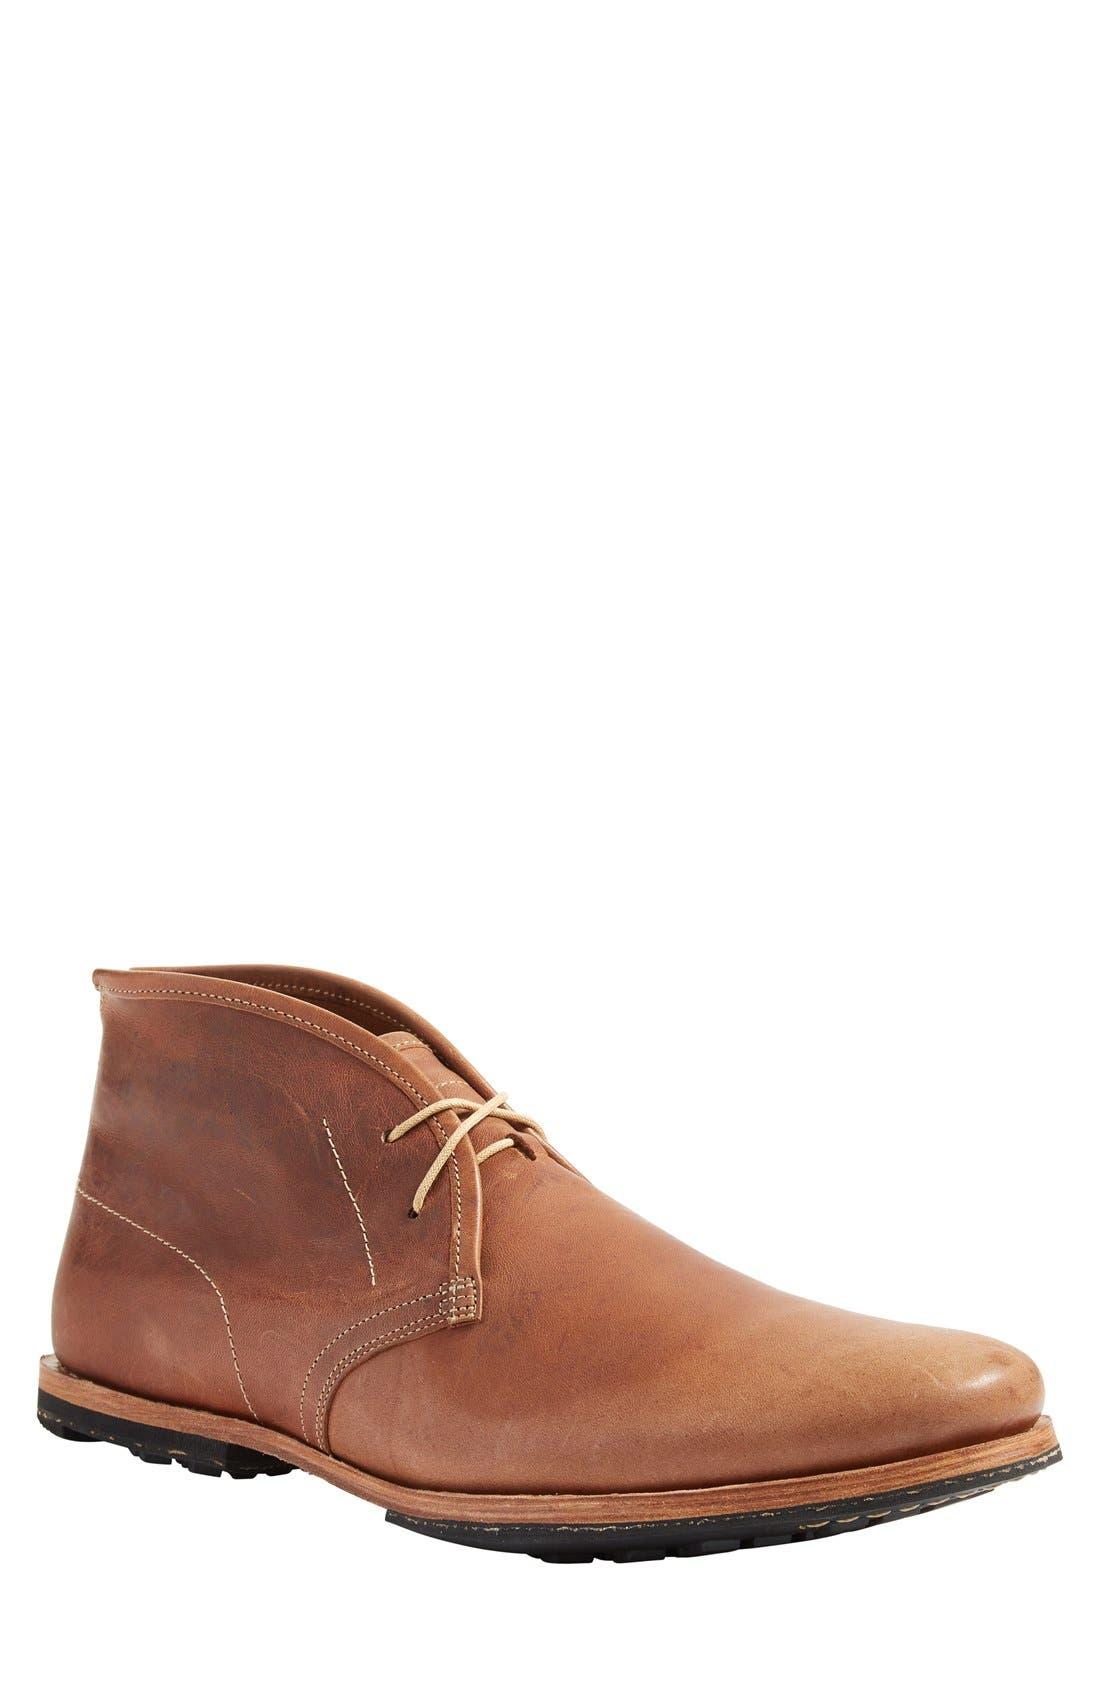 timberland 5 eye chukka boots